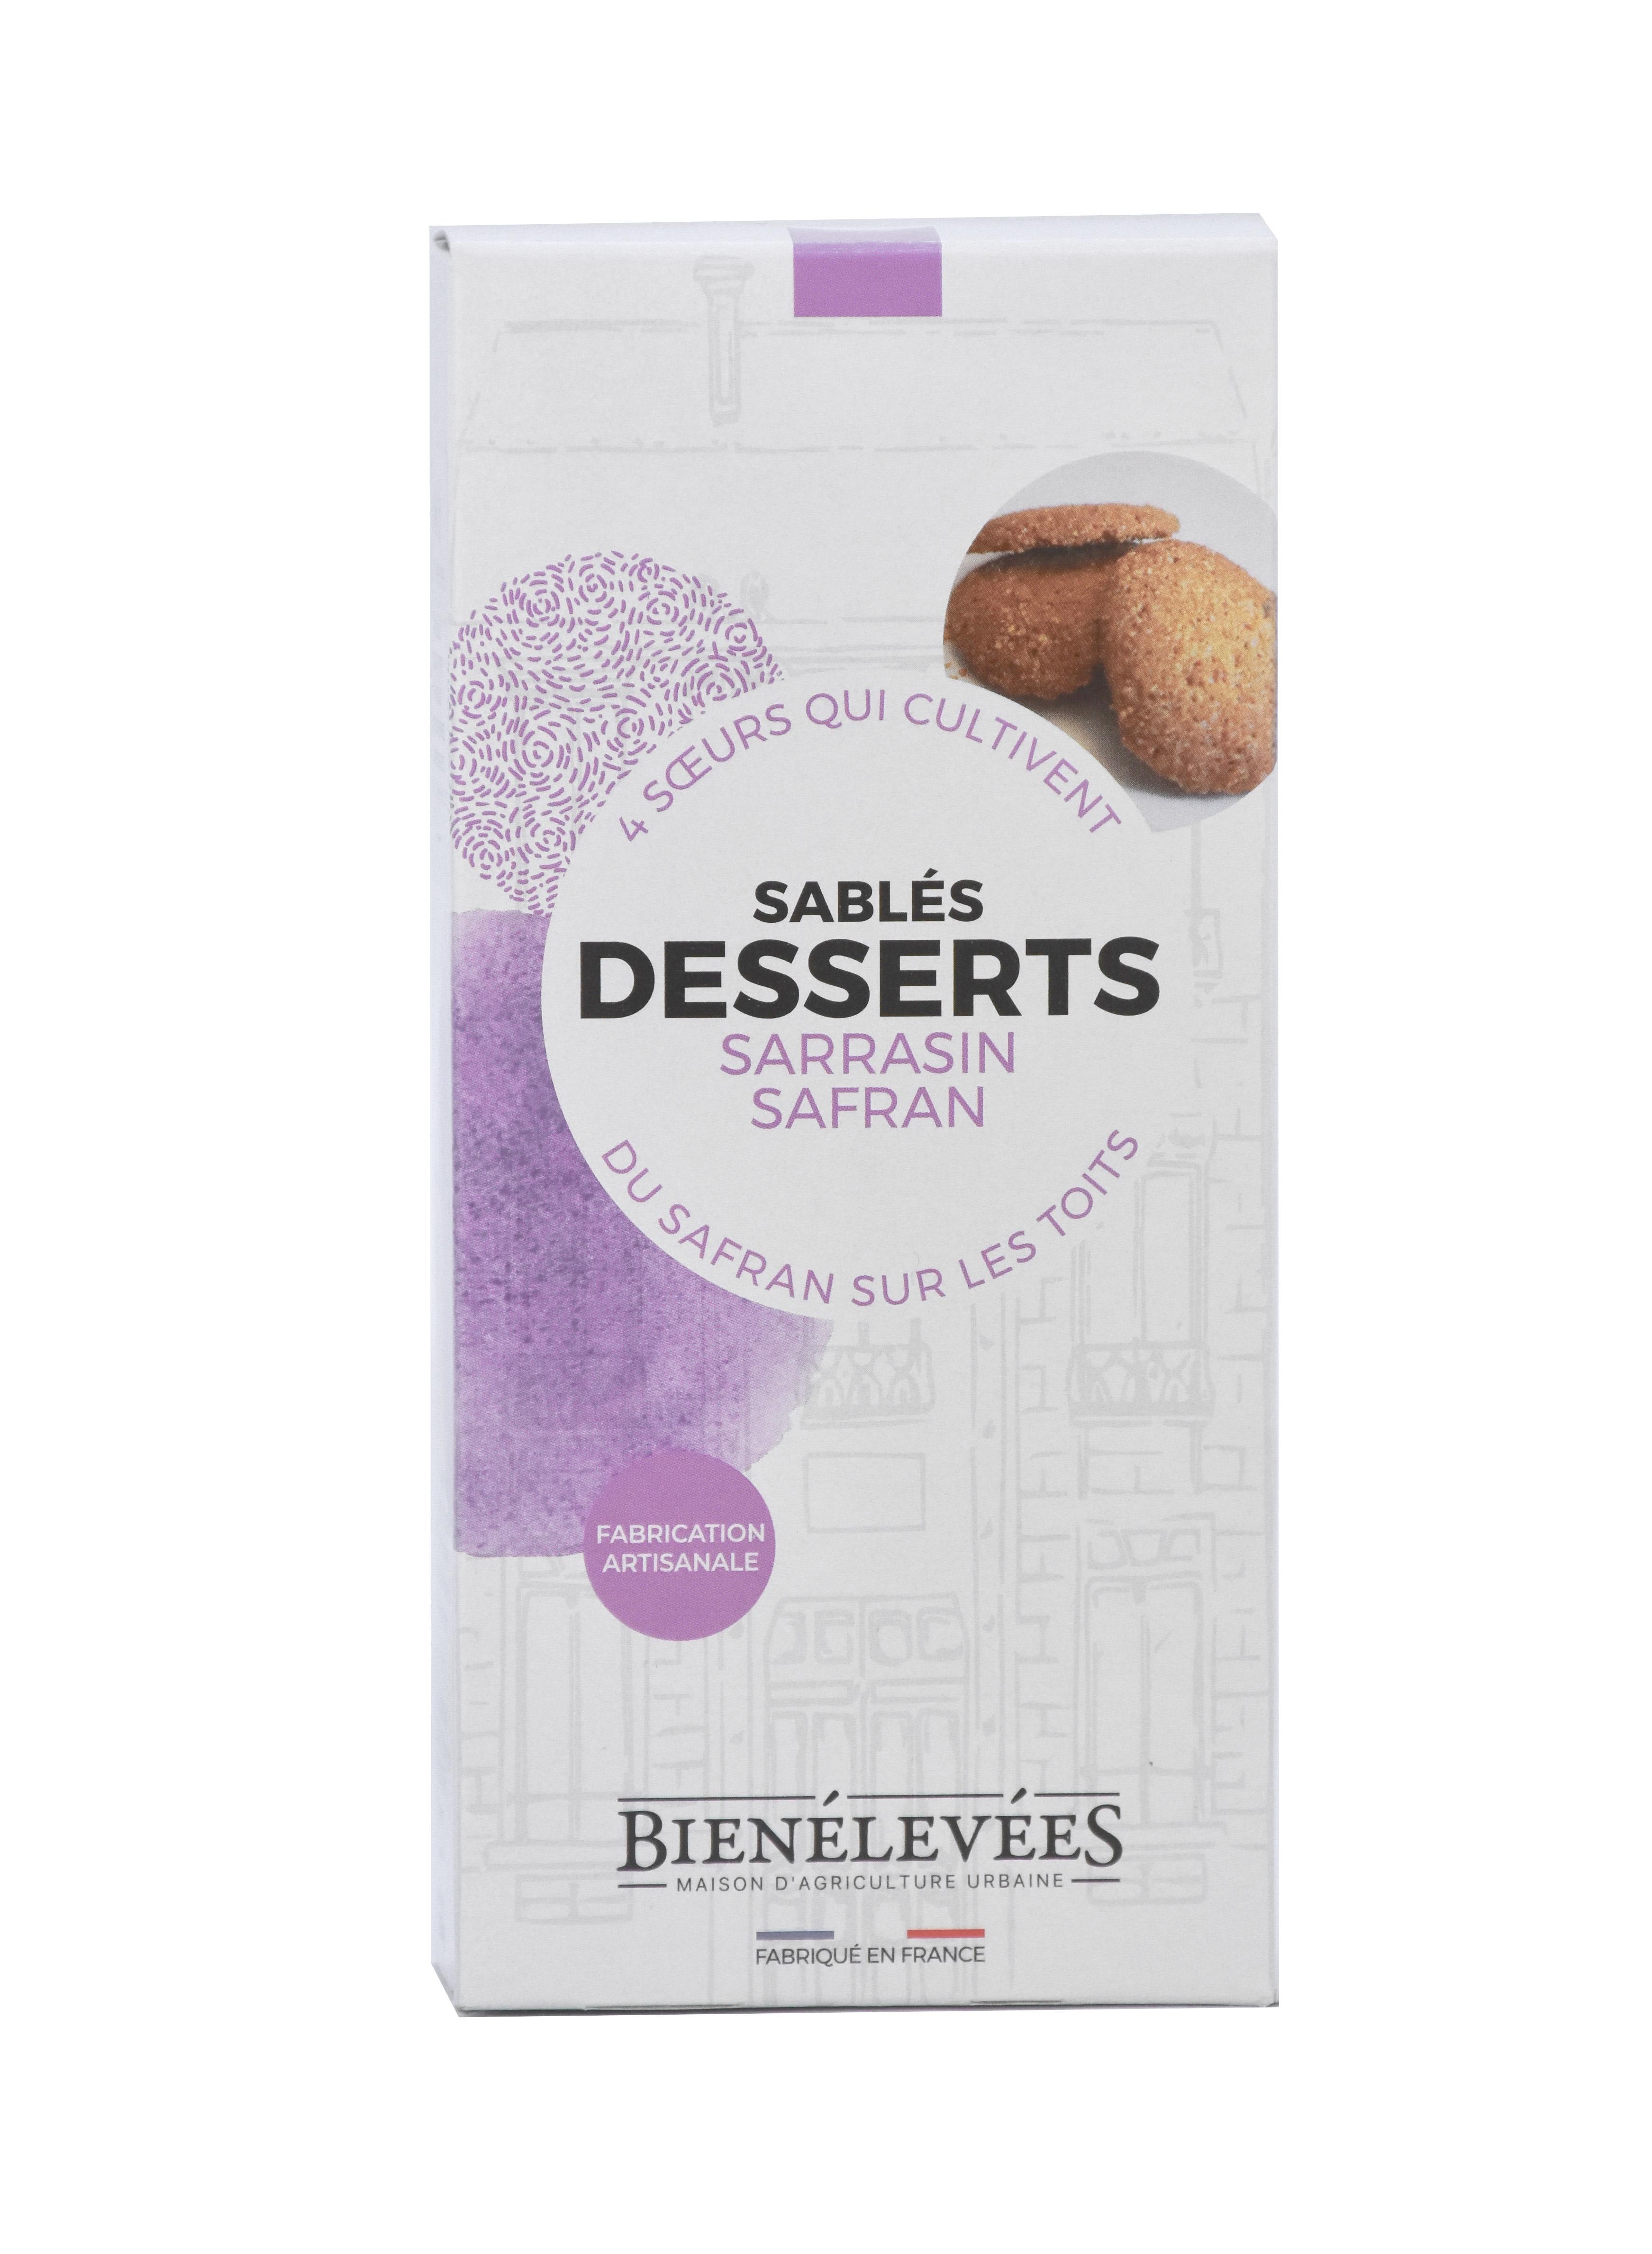 Sables dessert - Sarrasin Safran